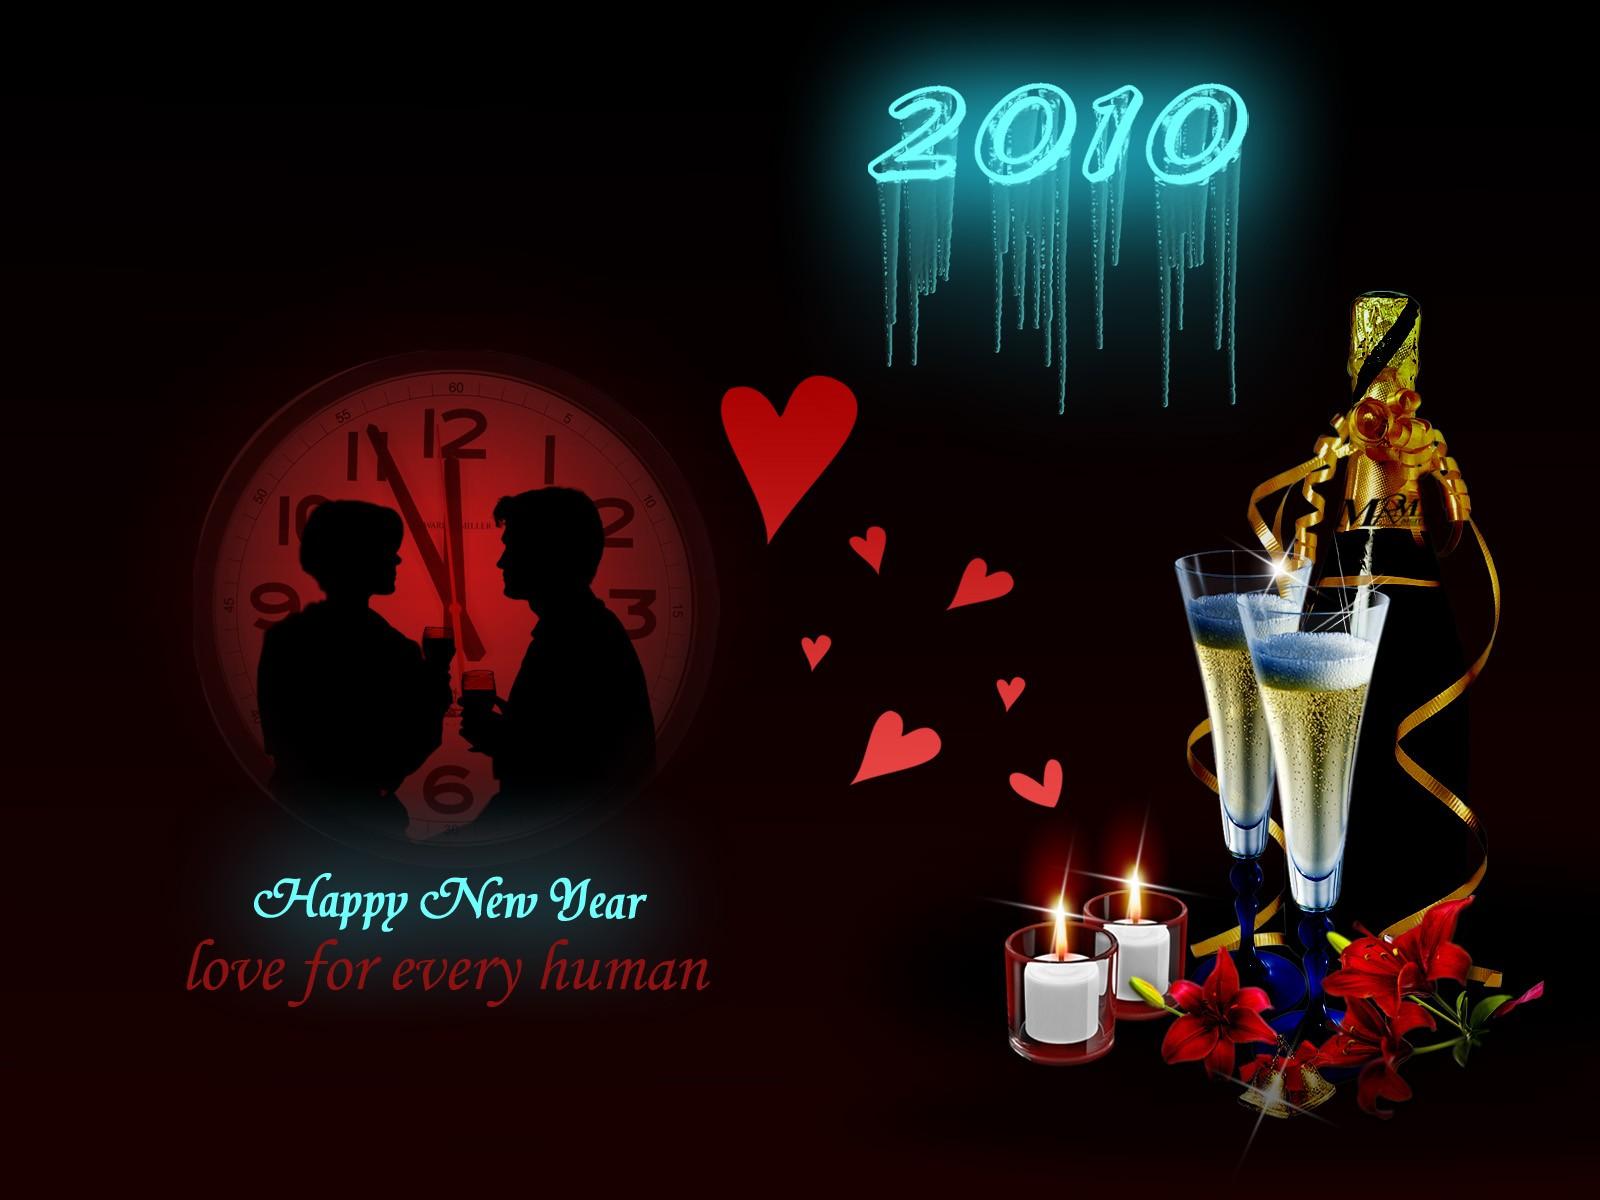 http://4.bp.blogspot.com/_ESBpOteBXQw/TMa_f-1syvI/AAAAAAAAFKg/-kDeaxW8iD4/s1600/happy-new-year-201017.jpg